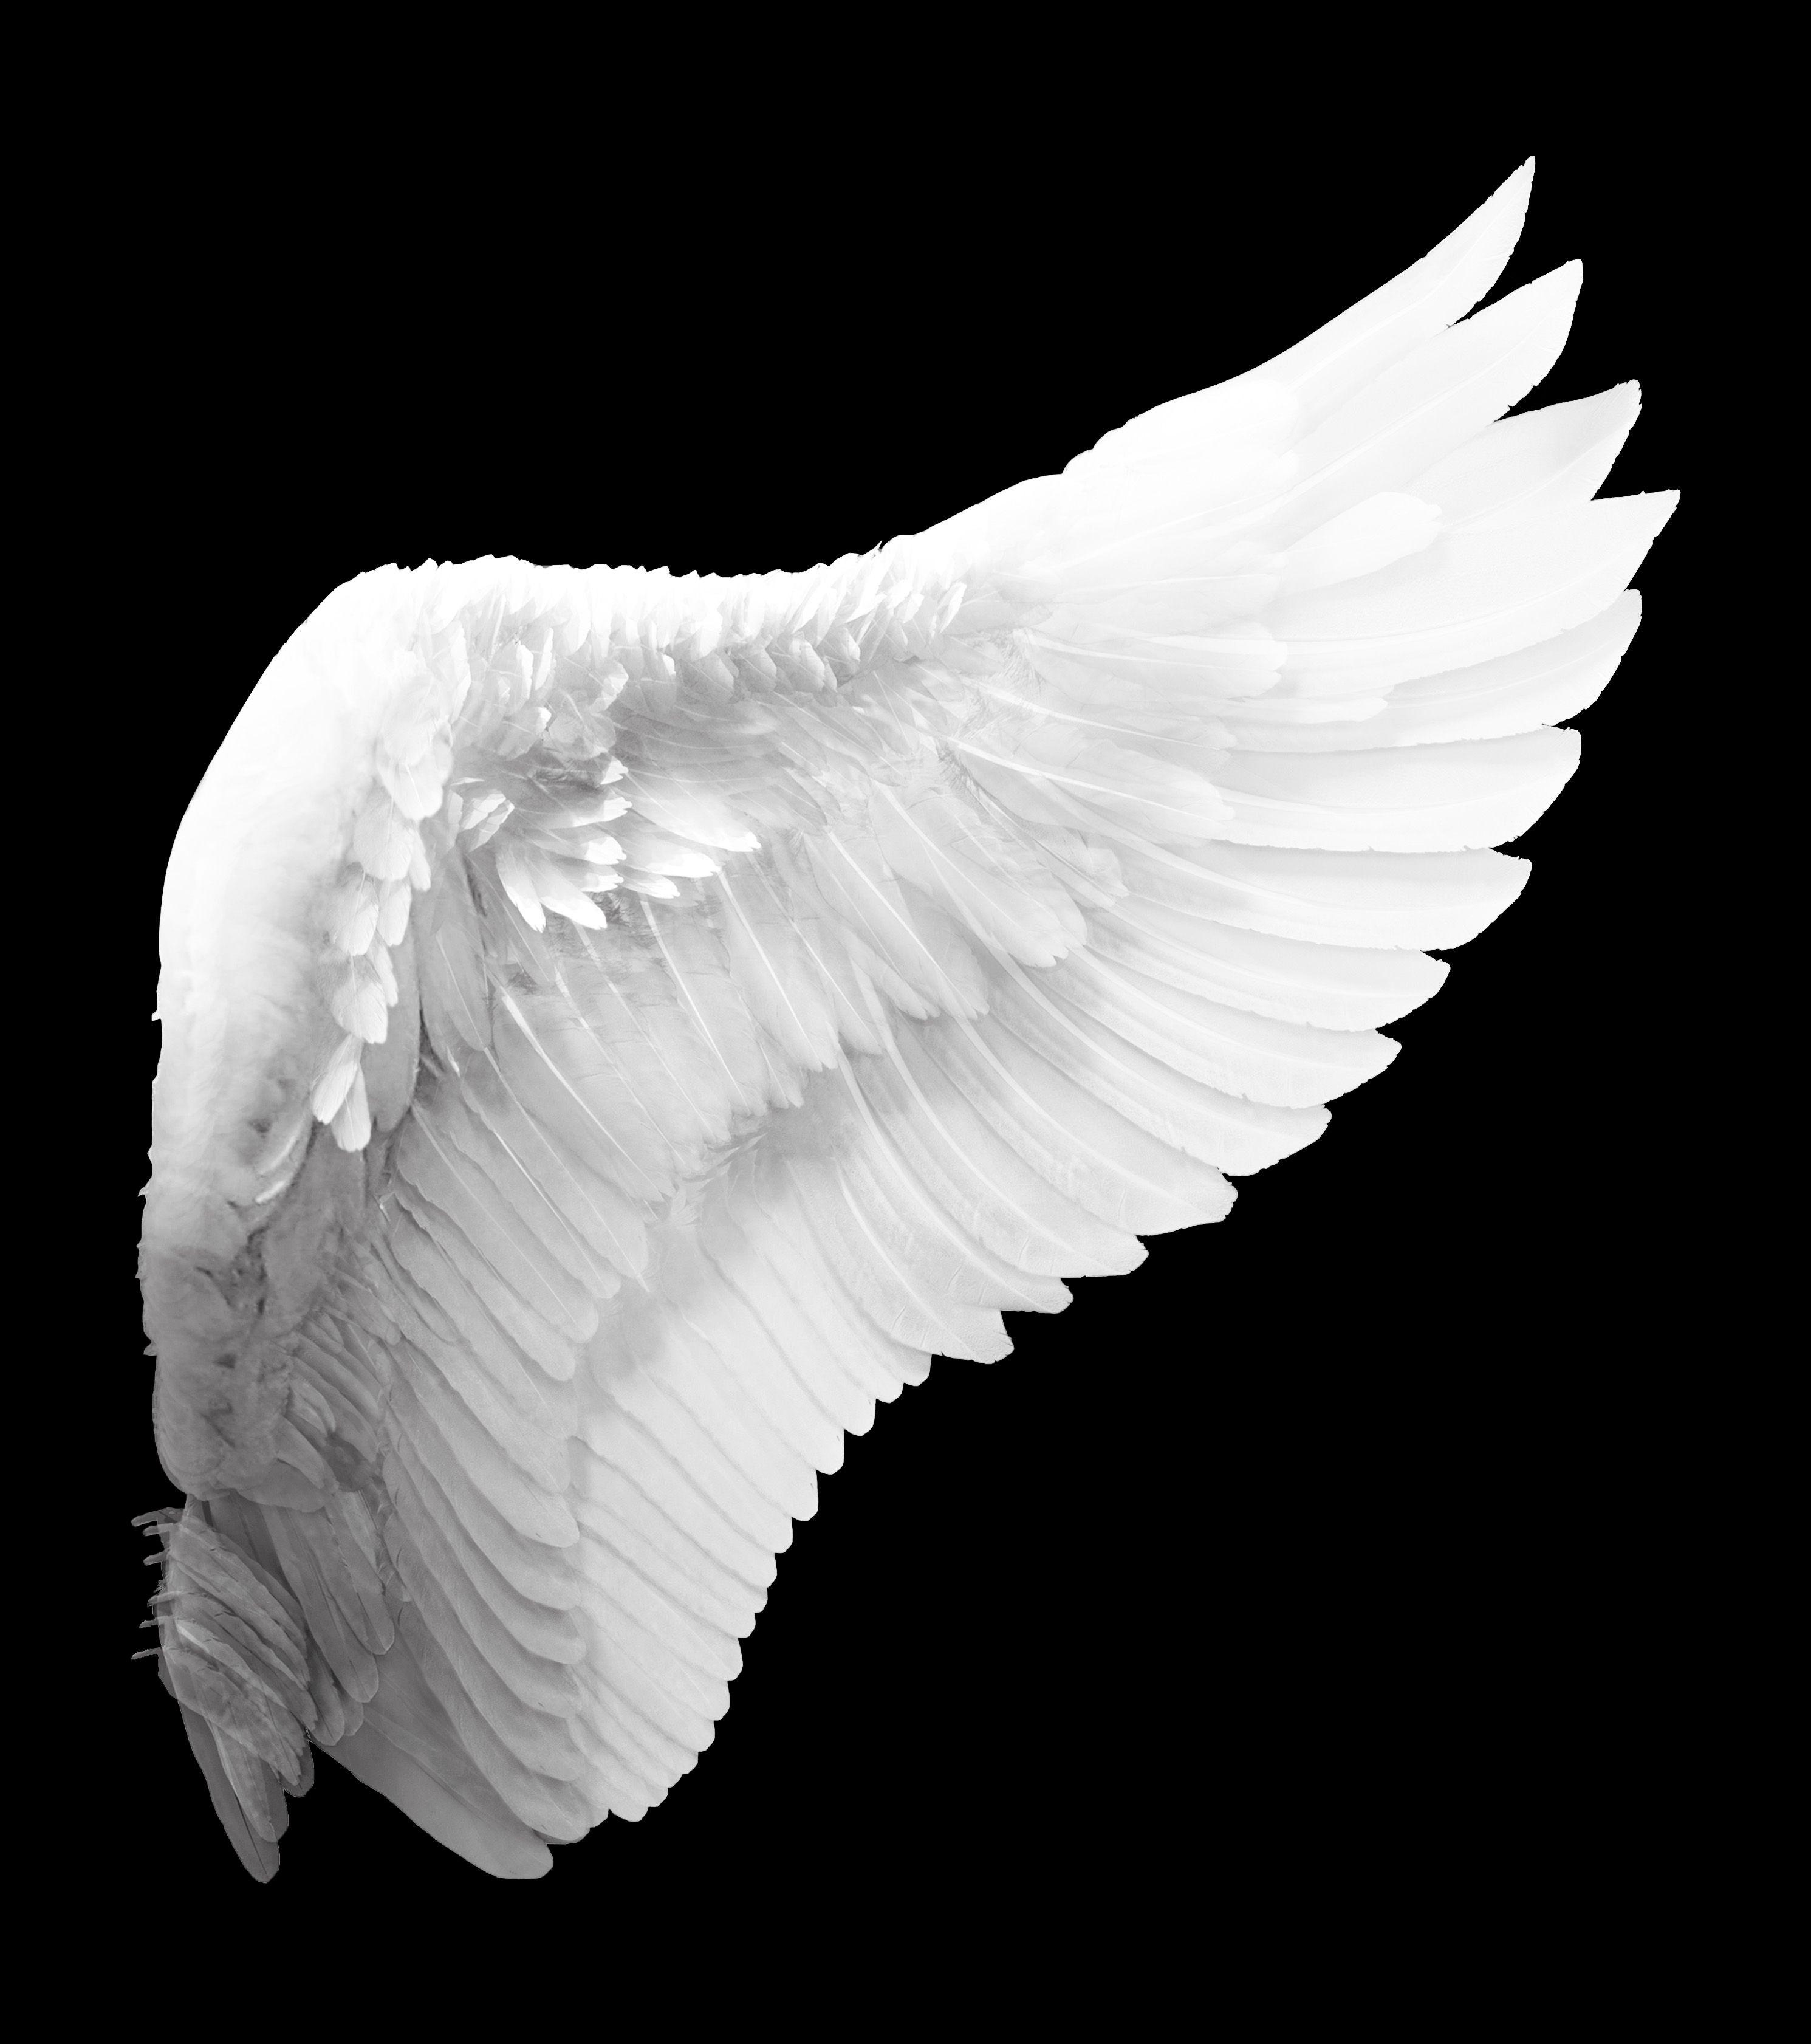 L686 1432587857 222089 Full 2 981 3 364 Pixels White Angel Wings Wings Art Wings Drawing